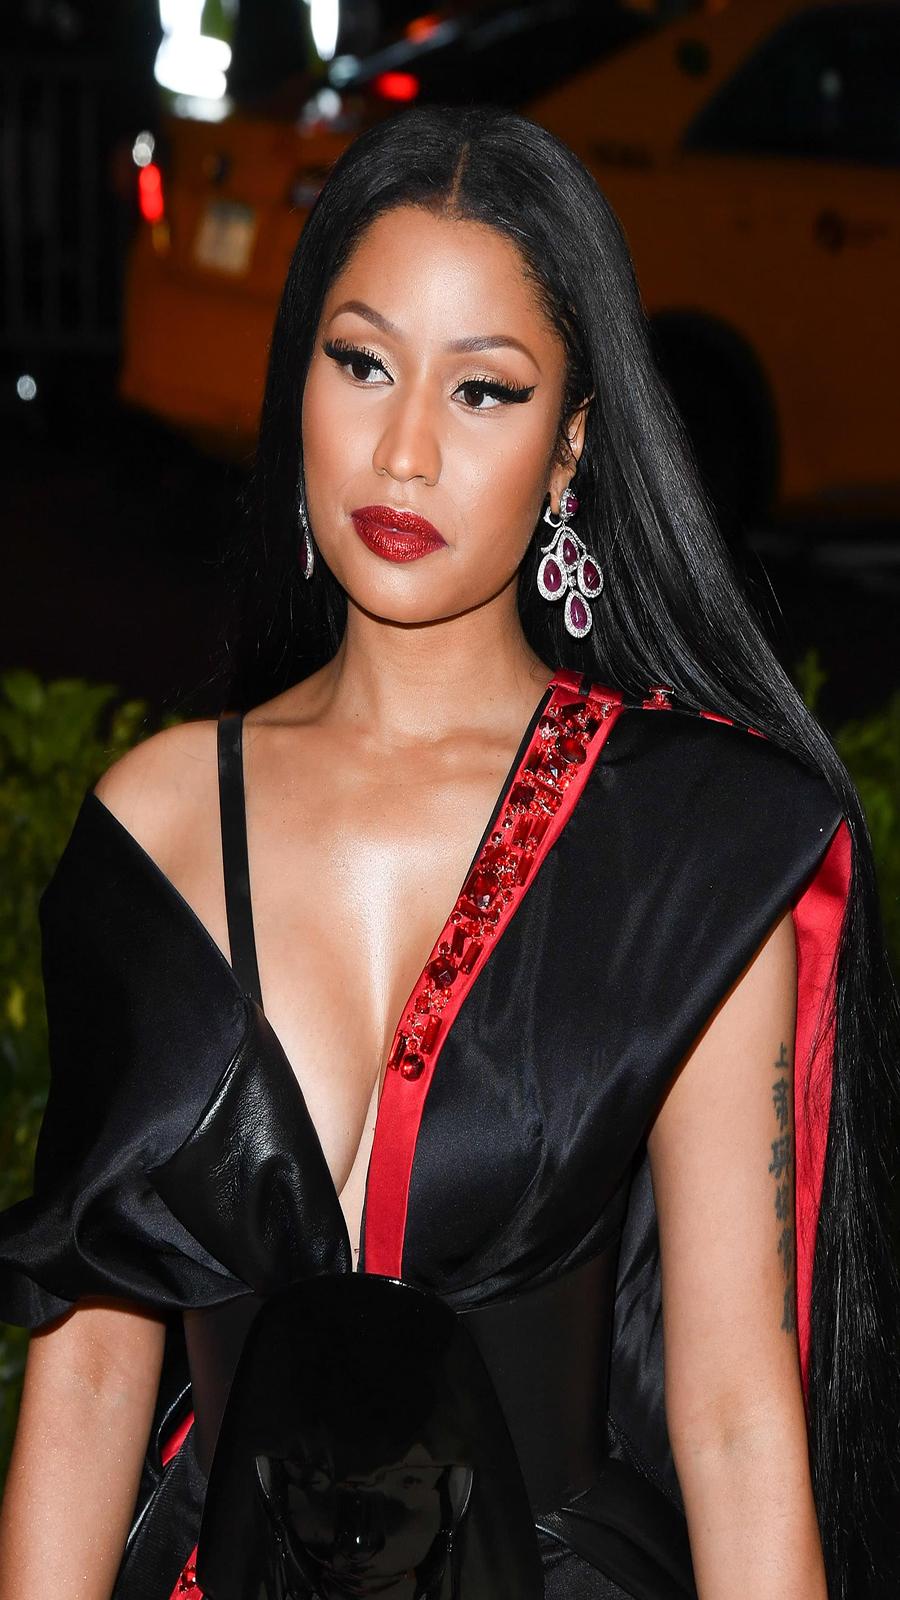 Nicki Minaj Fashion Show HD Wallpapers